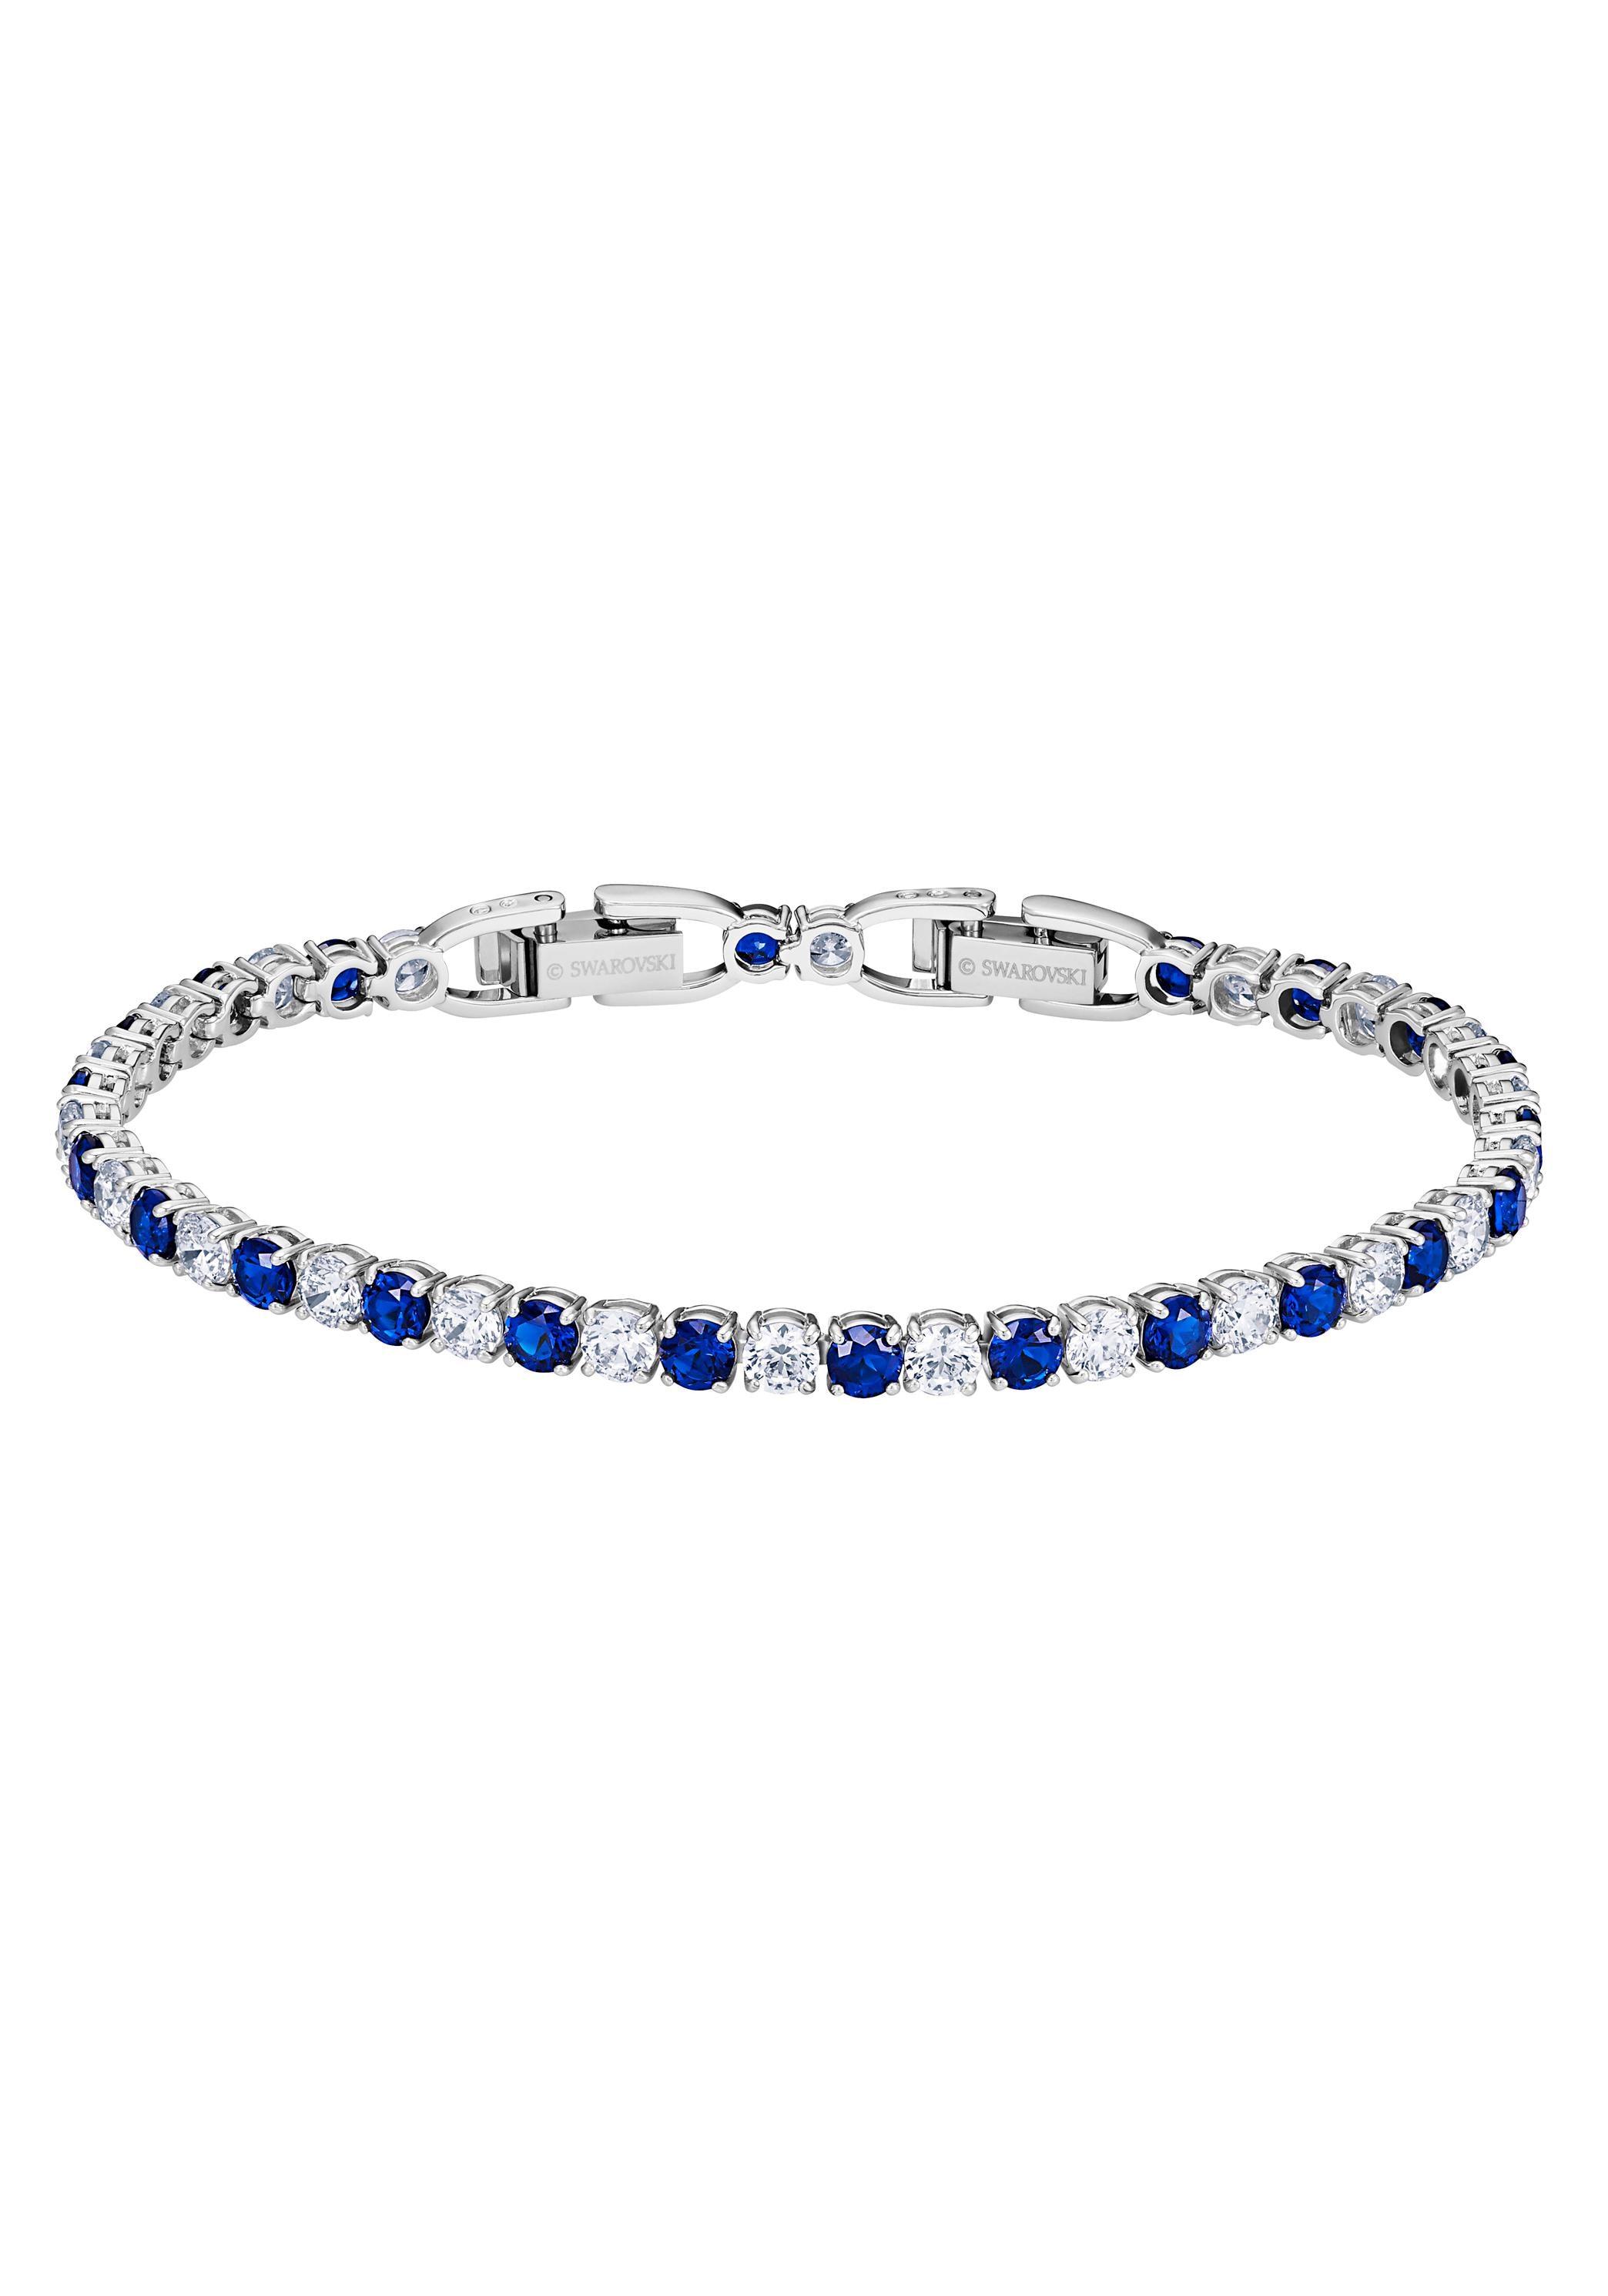 Swarovski Tennisarmband DLX MIX M 5506253 | Schmuck > Armbänder > Tennisarmbänder | Blau | Swarovski